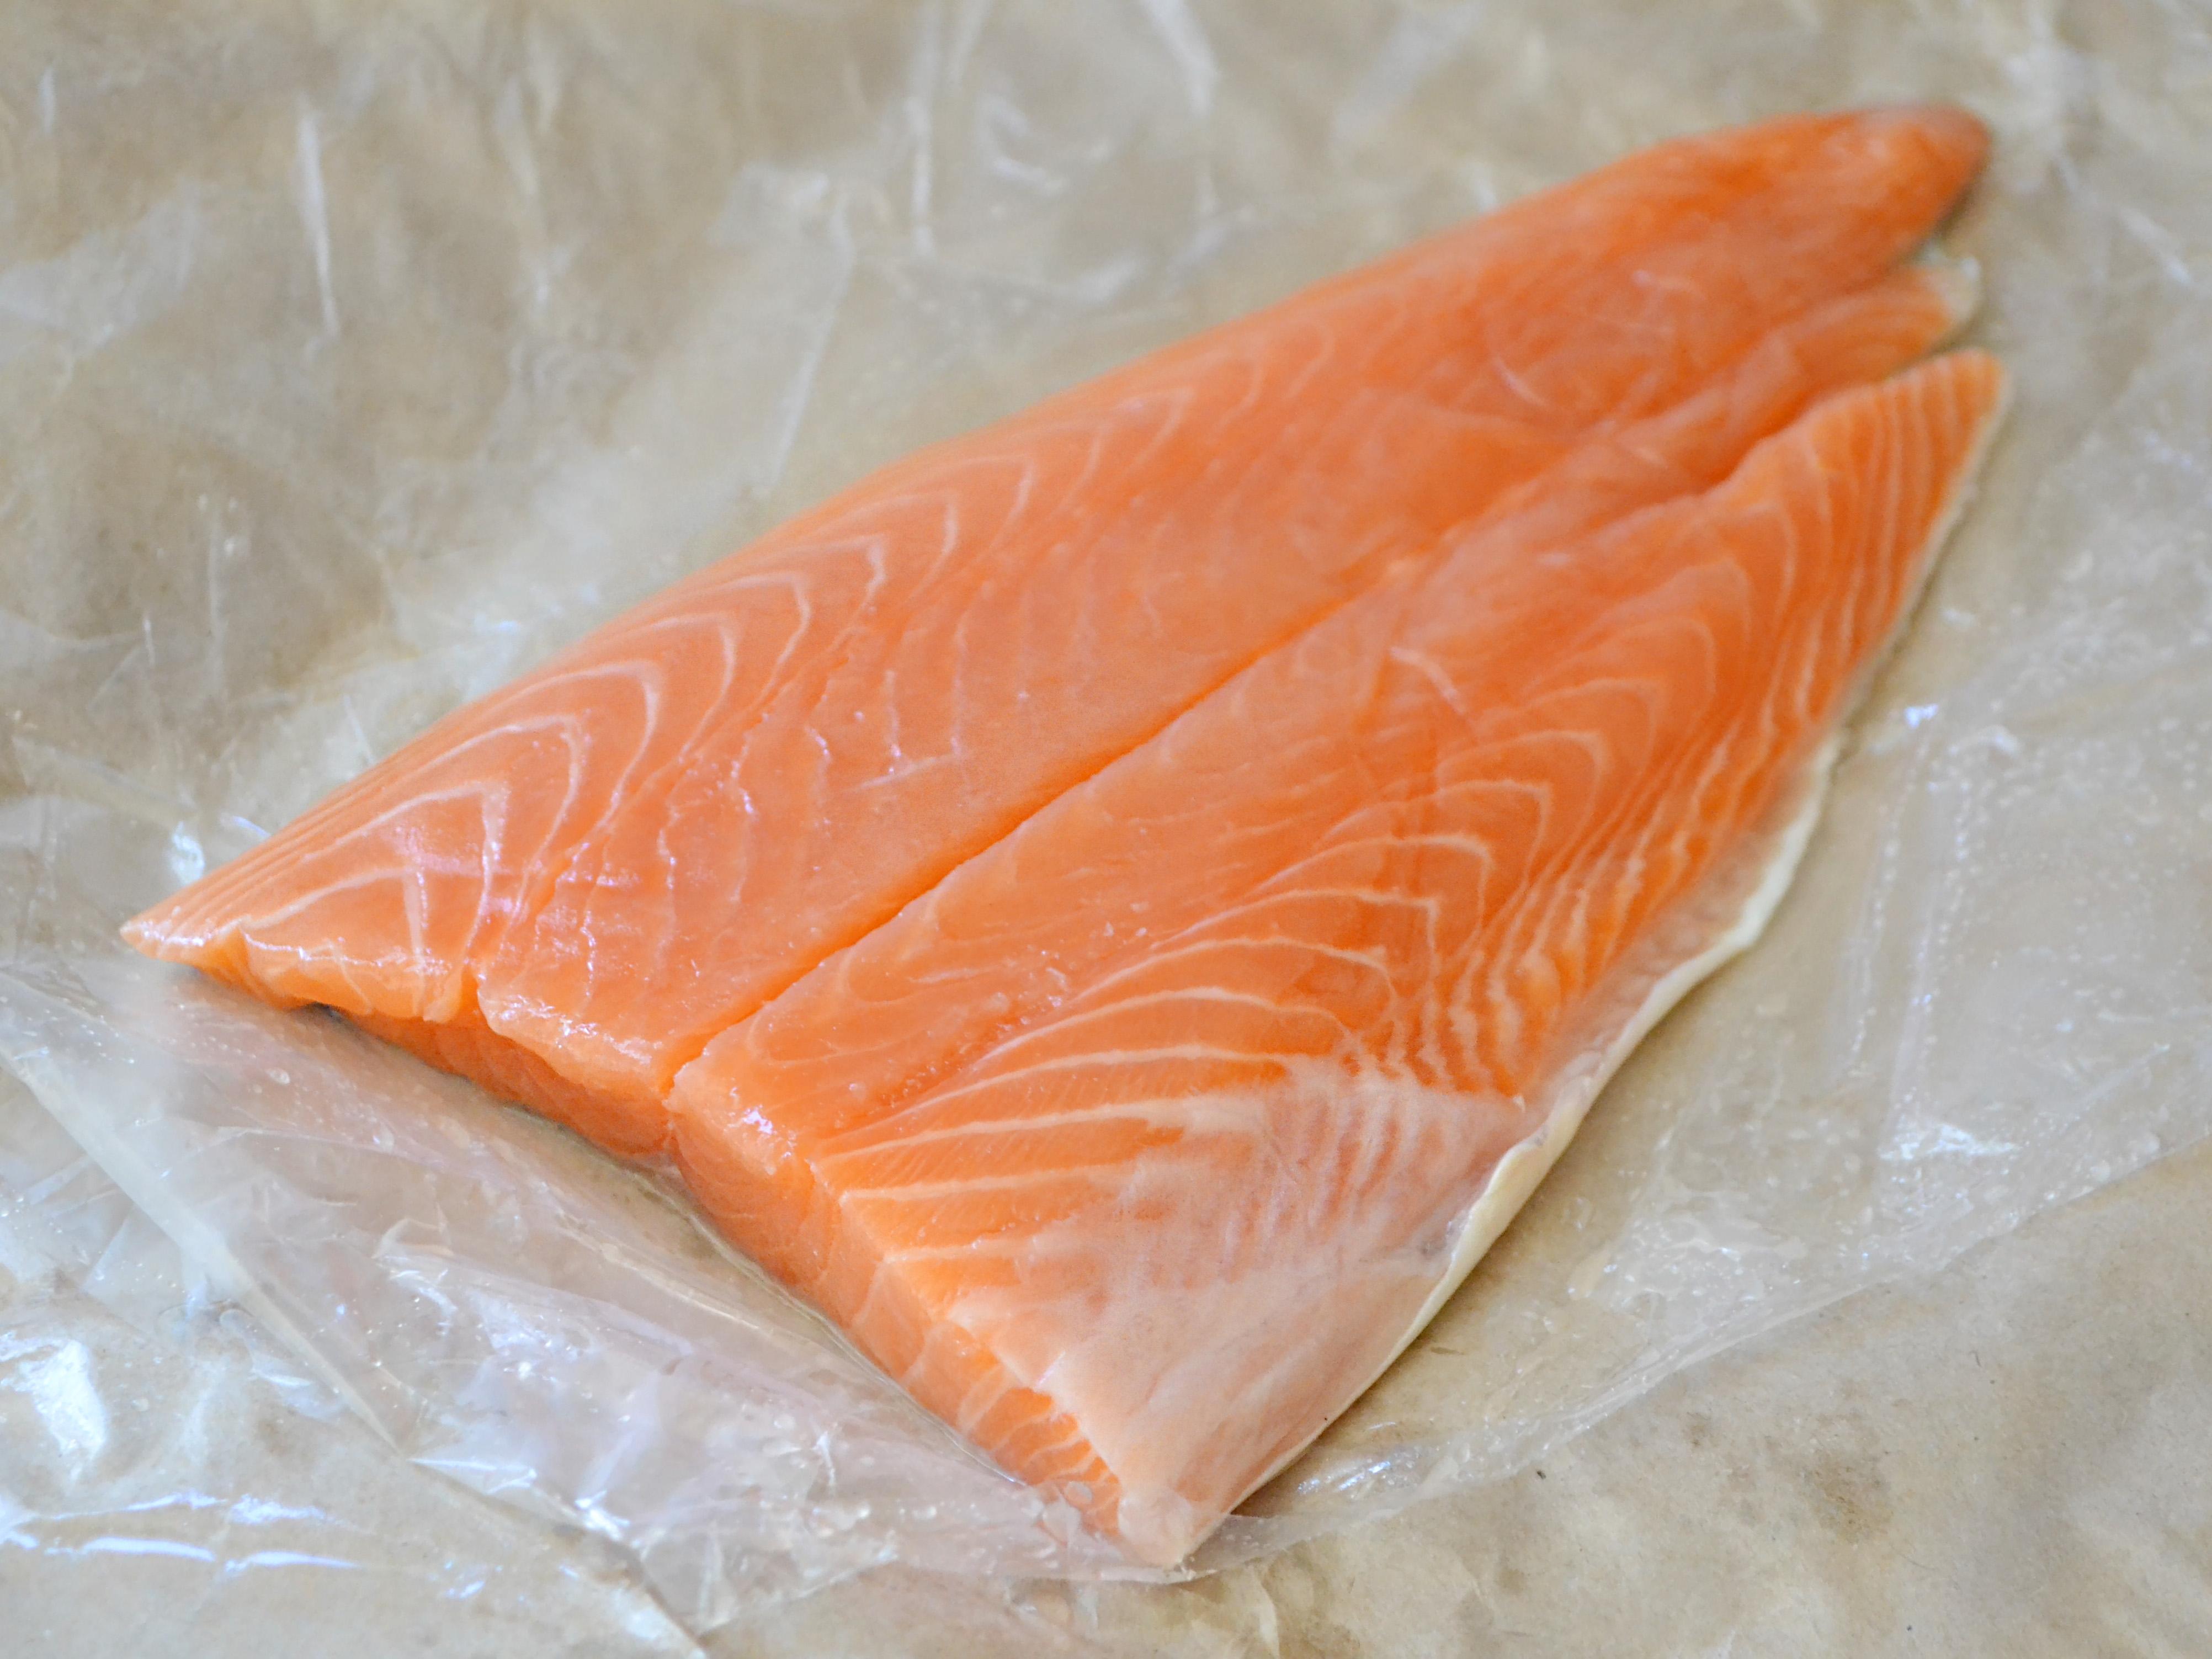 Recipe: Panseared Salmon In Cast Iron I'd